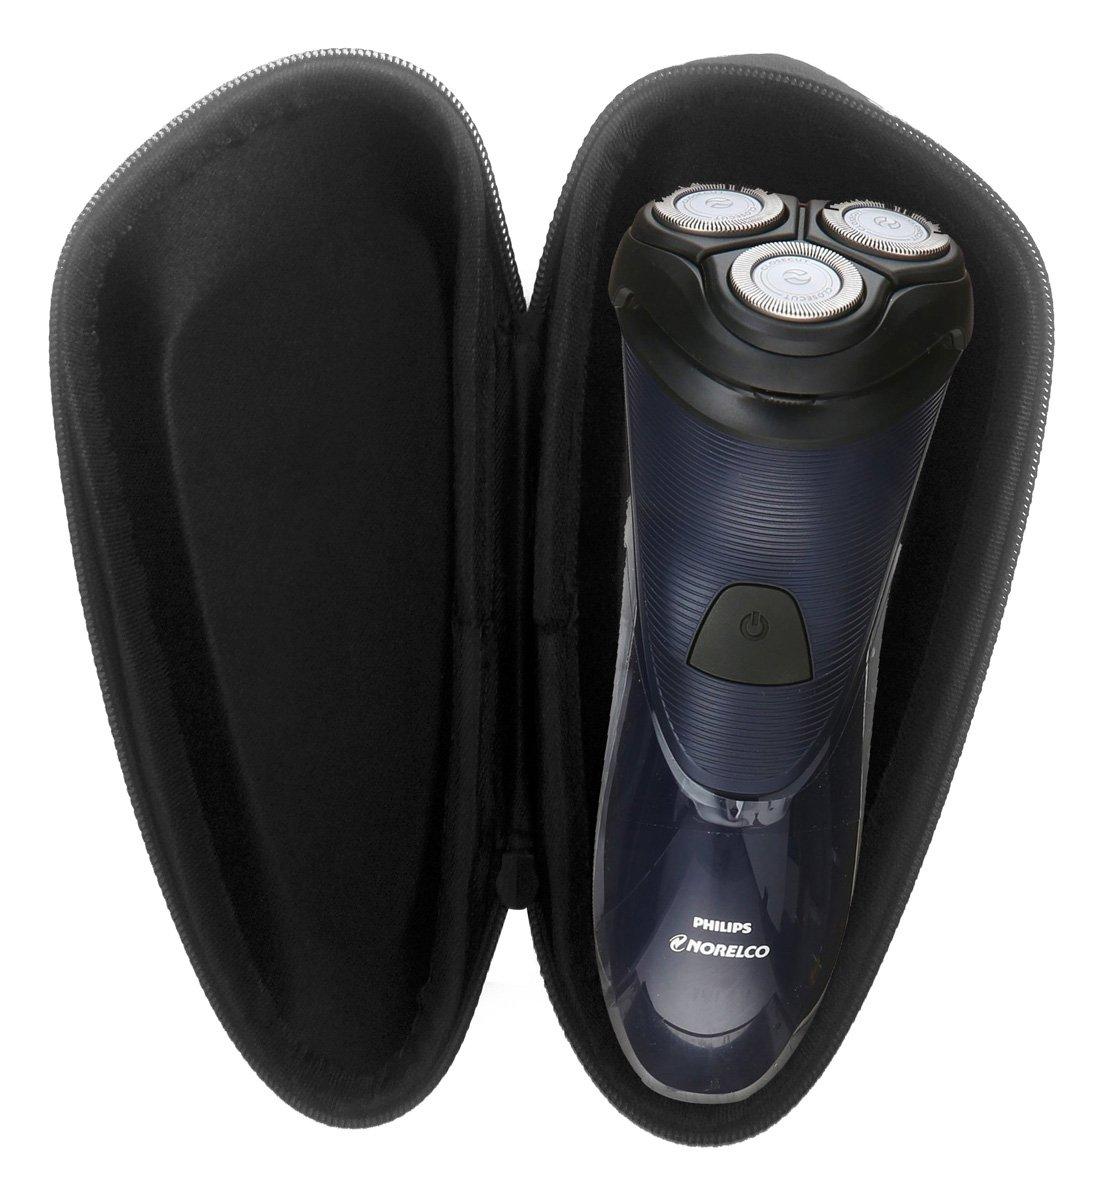 FitSand ( TM )ジッパーストレージEva Carry Travel保護ハードケースボックスバッグfor Philips Norelco電気シェーバー1100、s1150 / 81   B01HZSBSF0